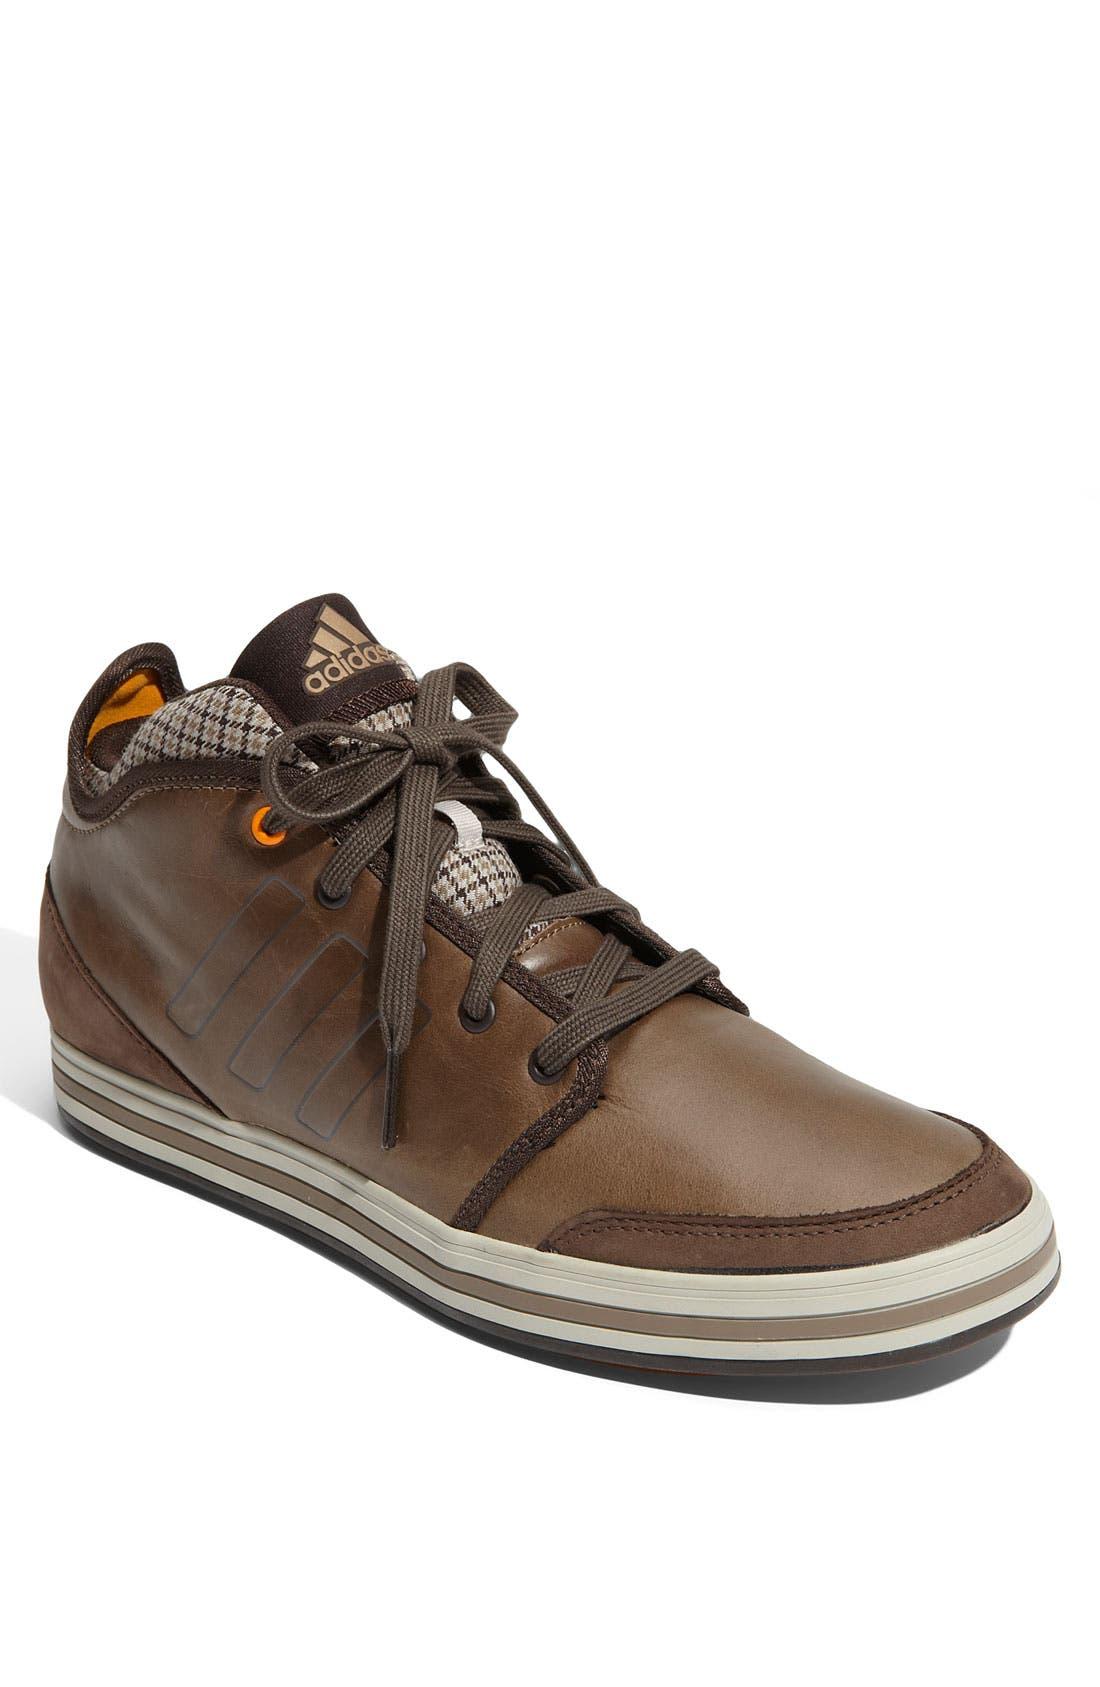 'Zeitfrei Mid' Sneaker, Main, color, 200